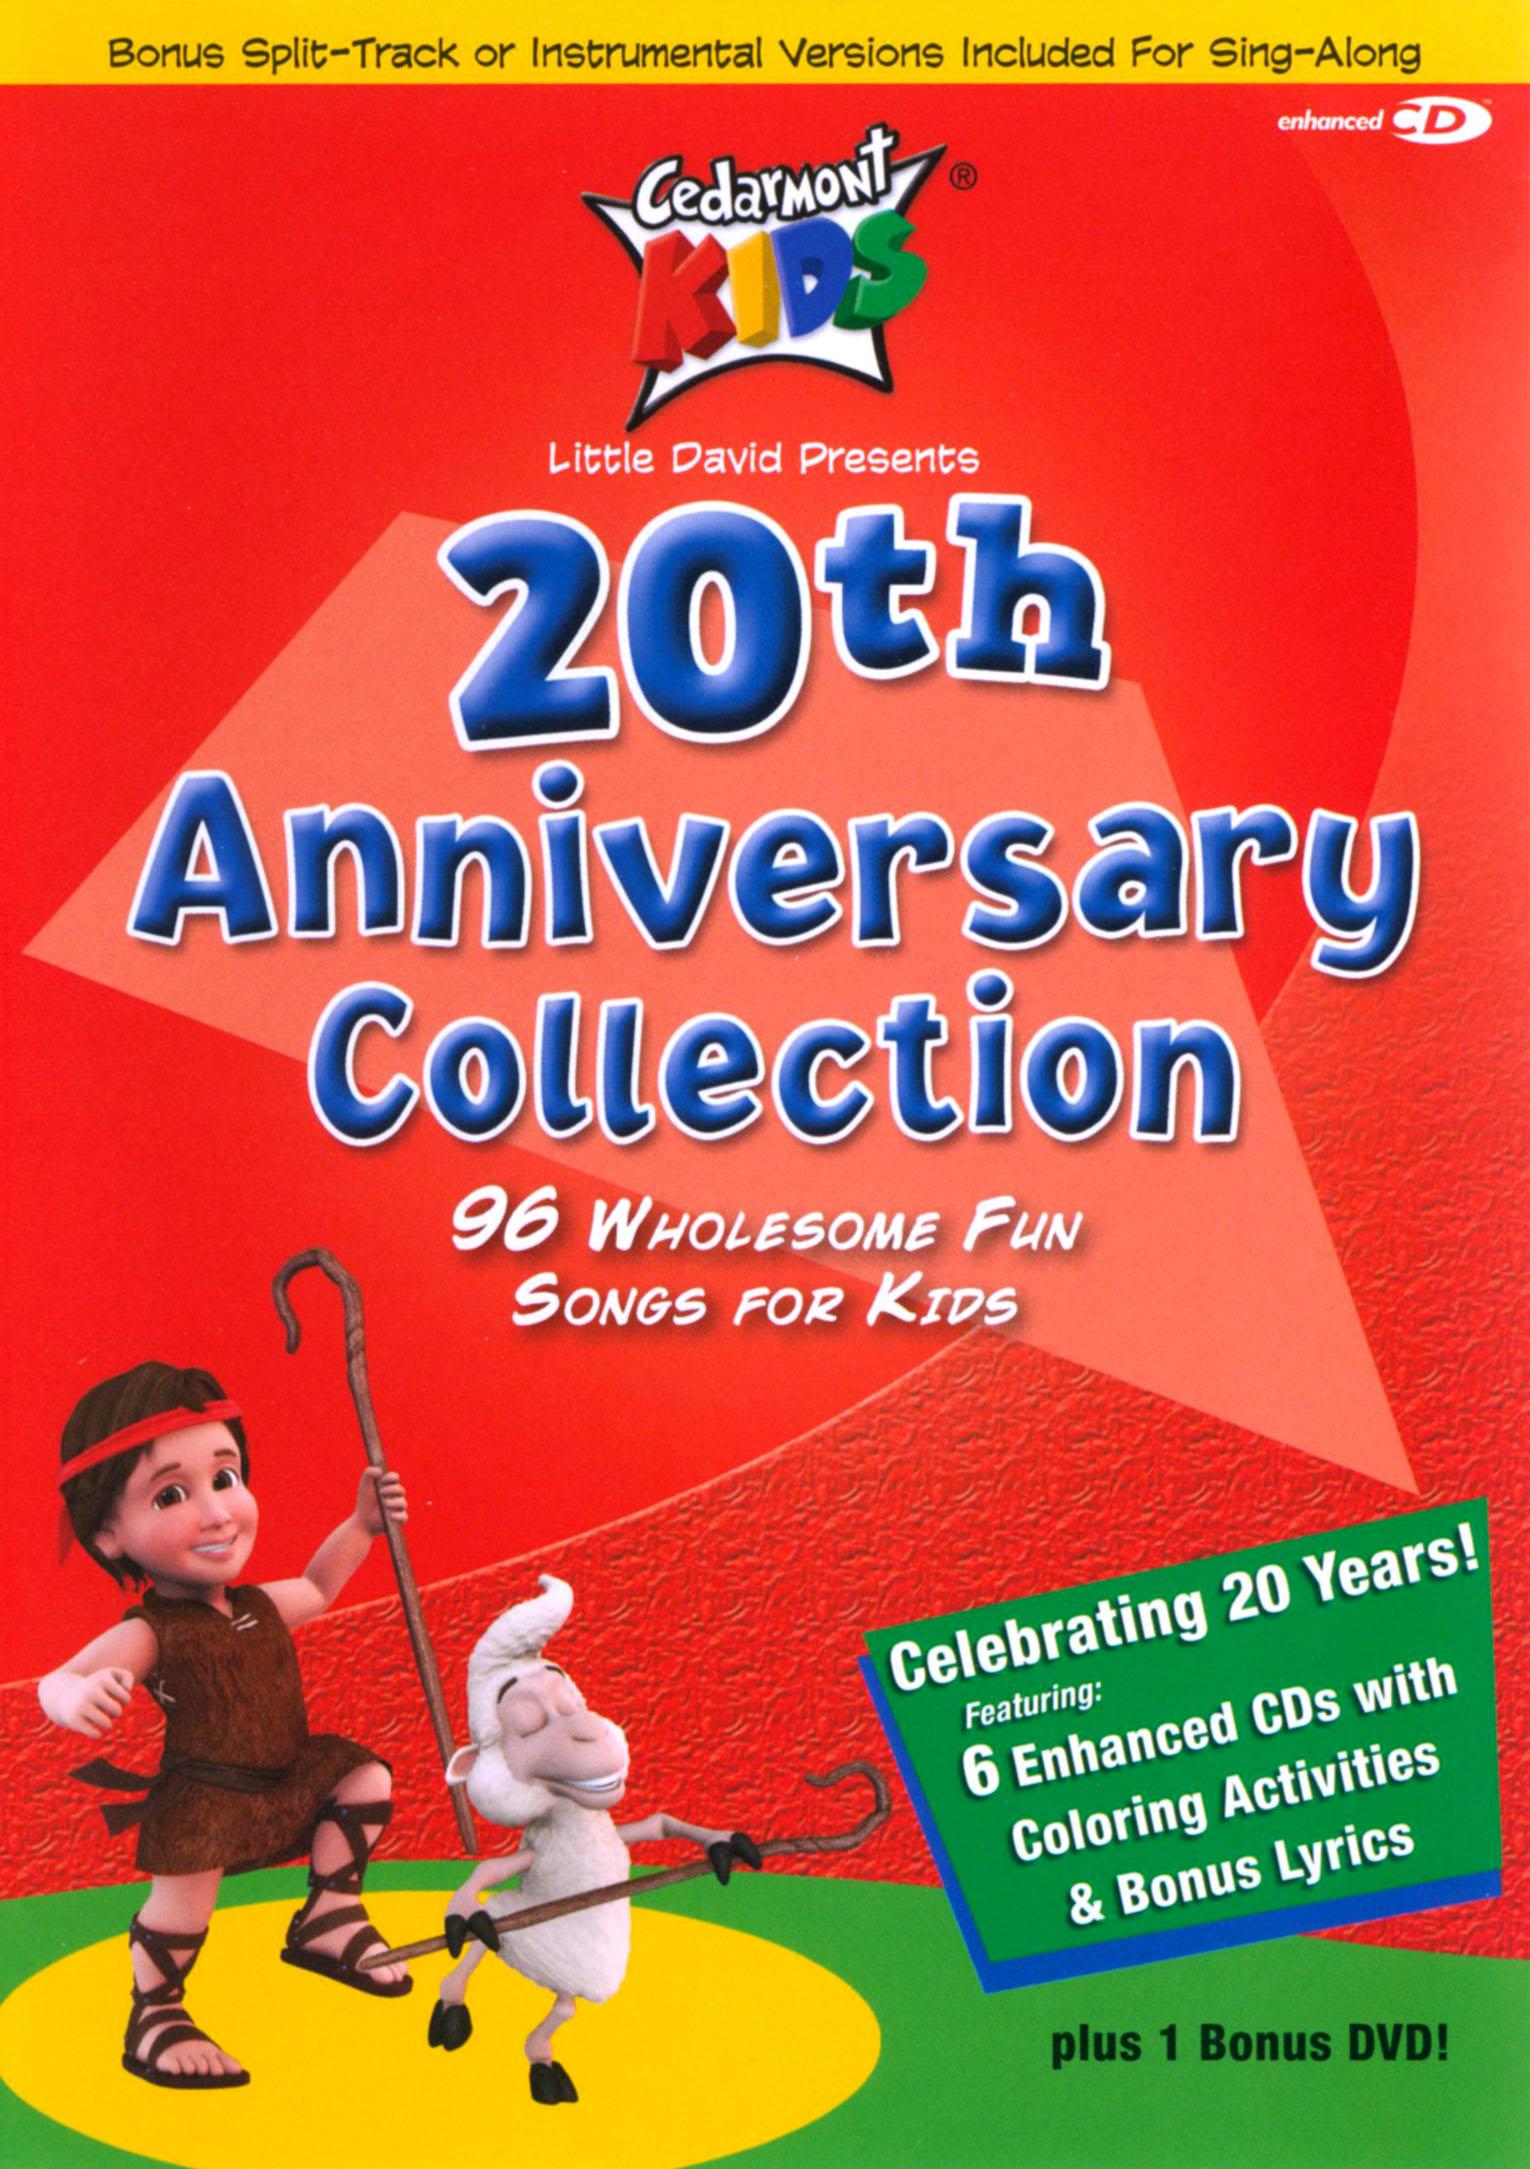 Cedarmont Kids: 20th Anniversary Celebration